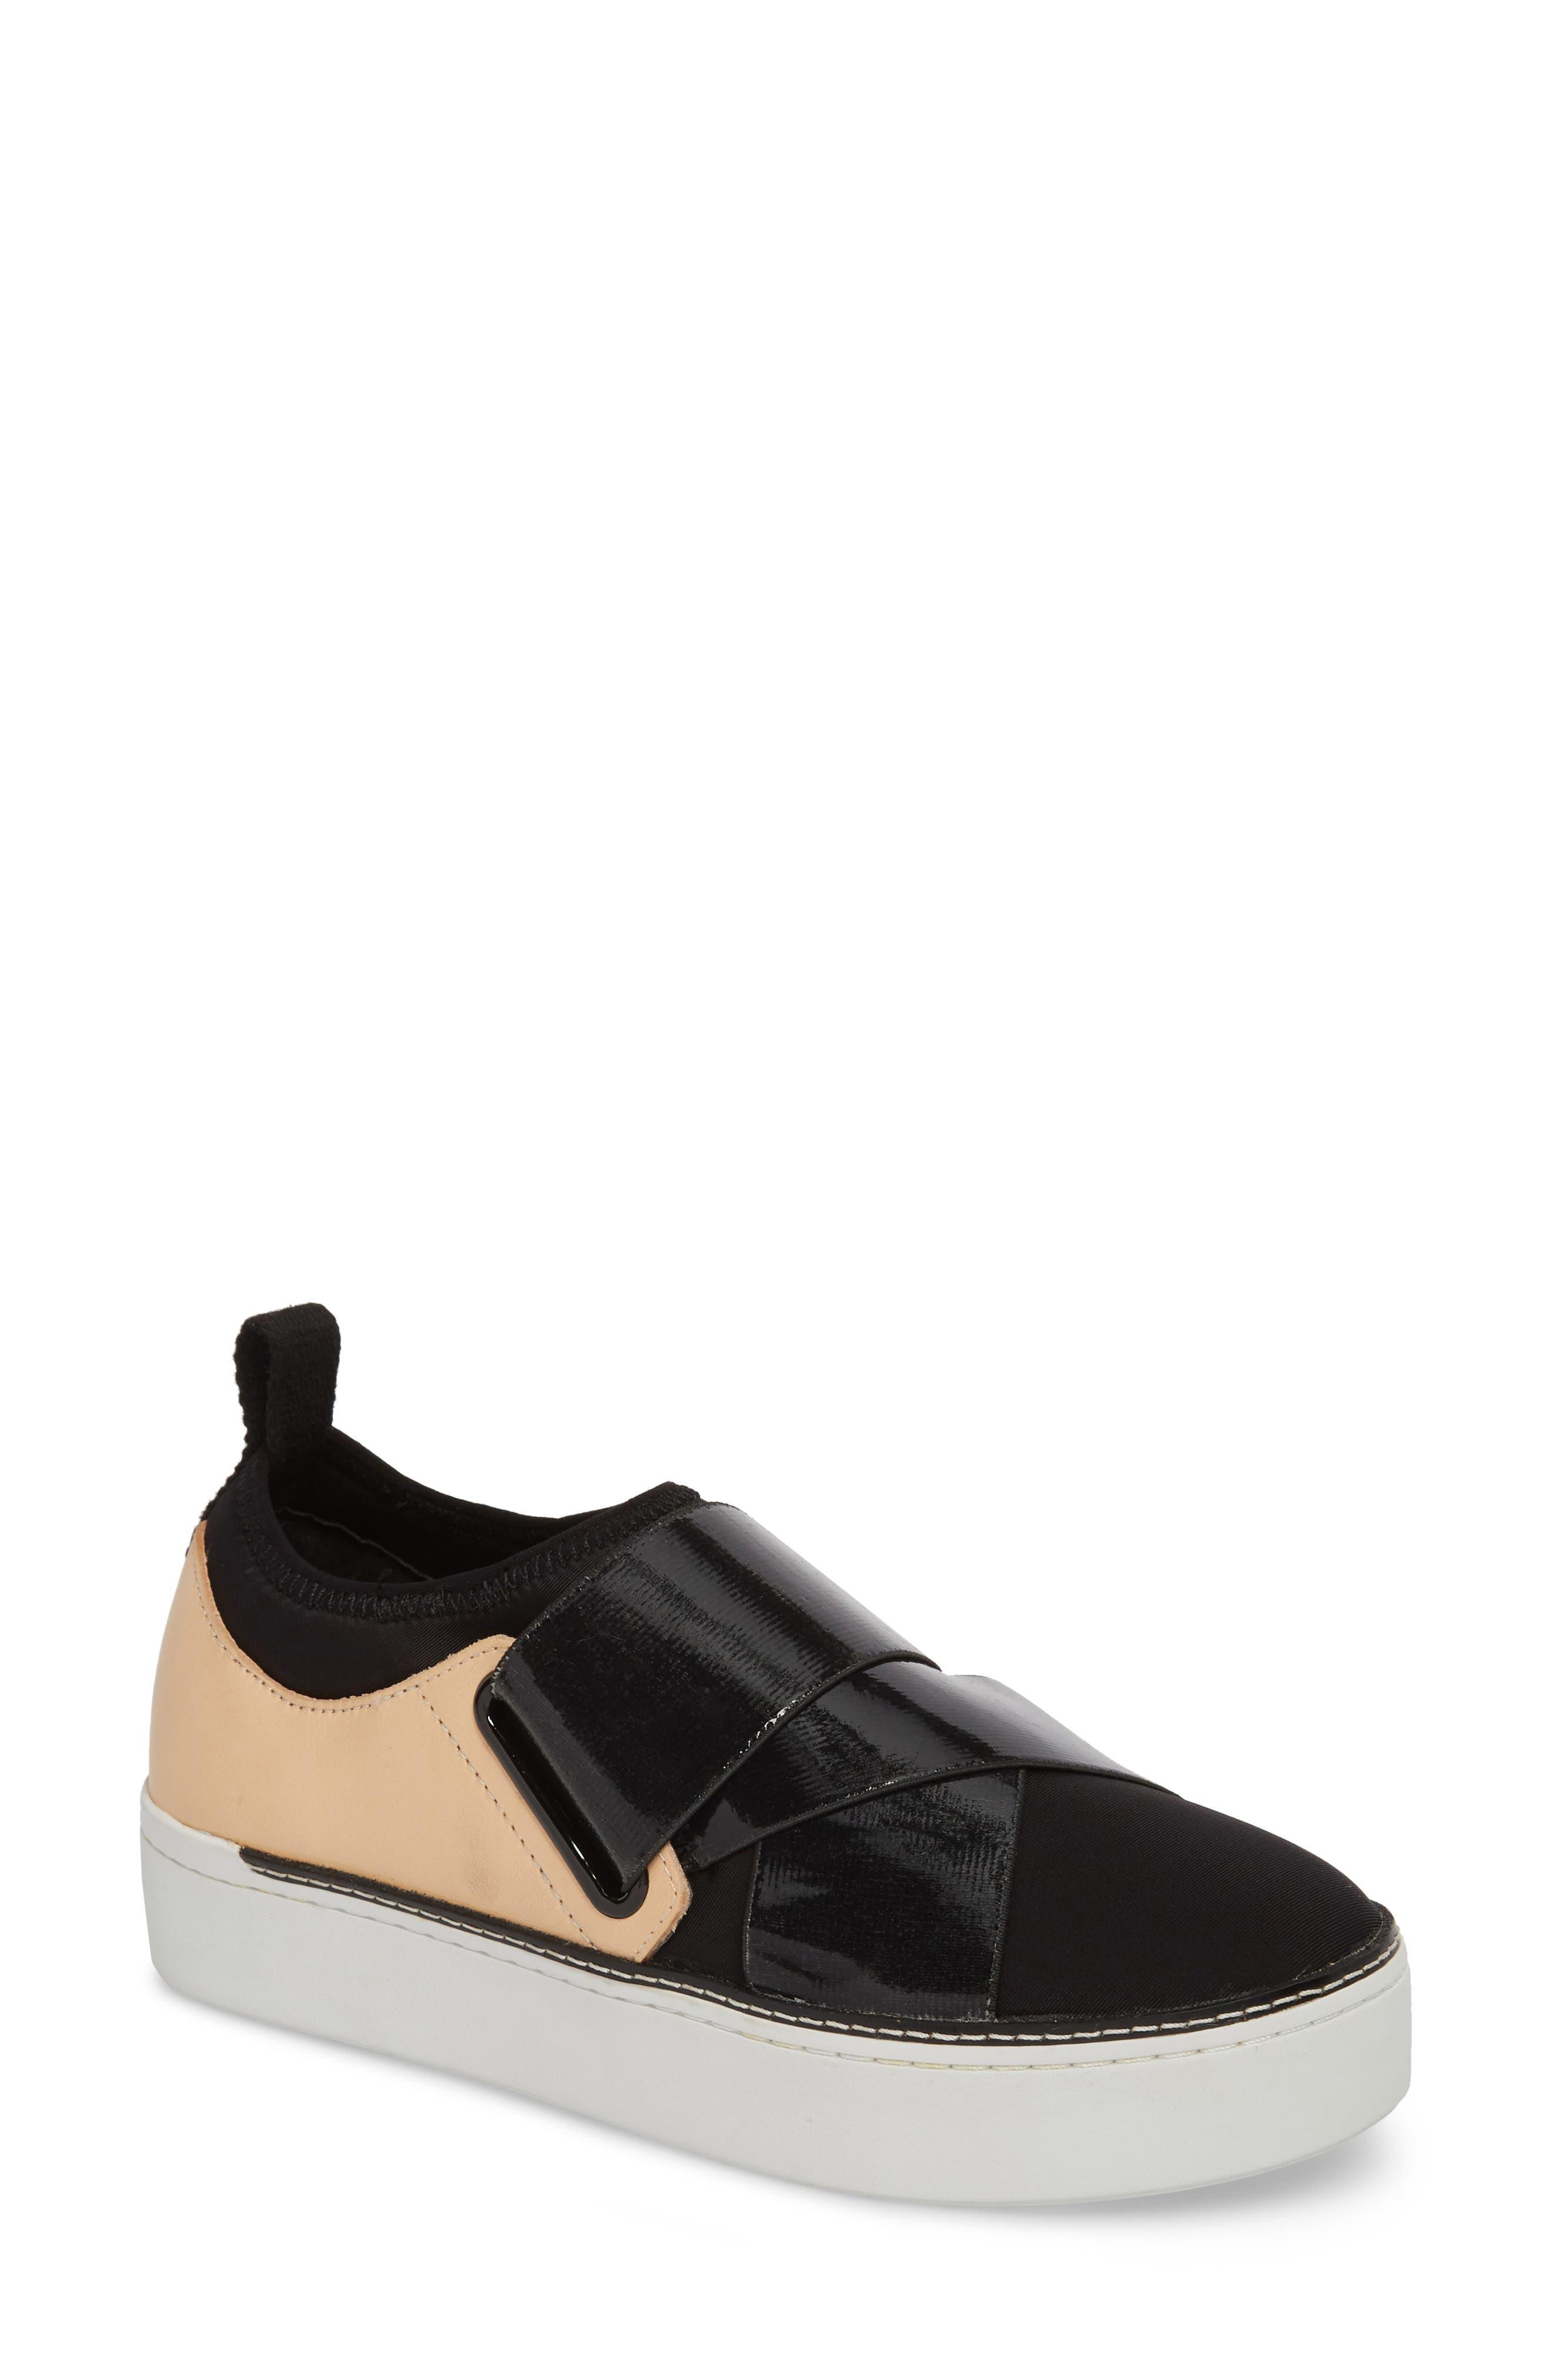 M4D3 Shannon Platform Sneaker- Black